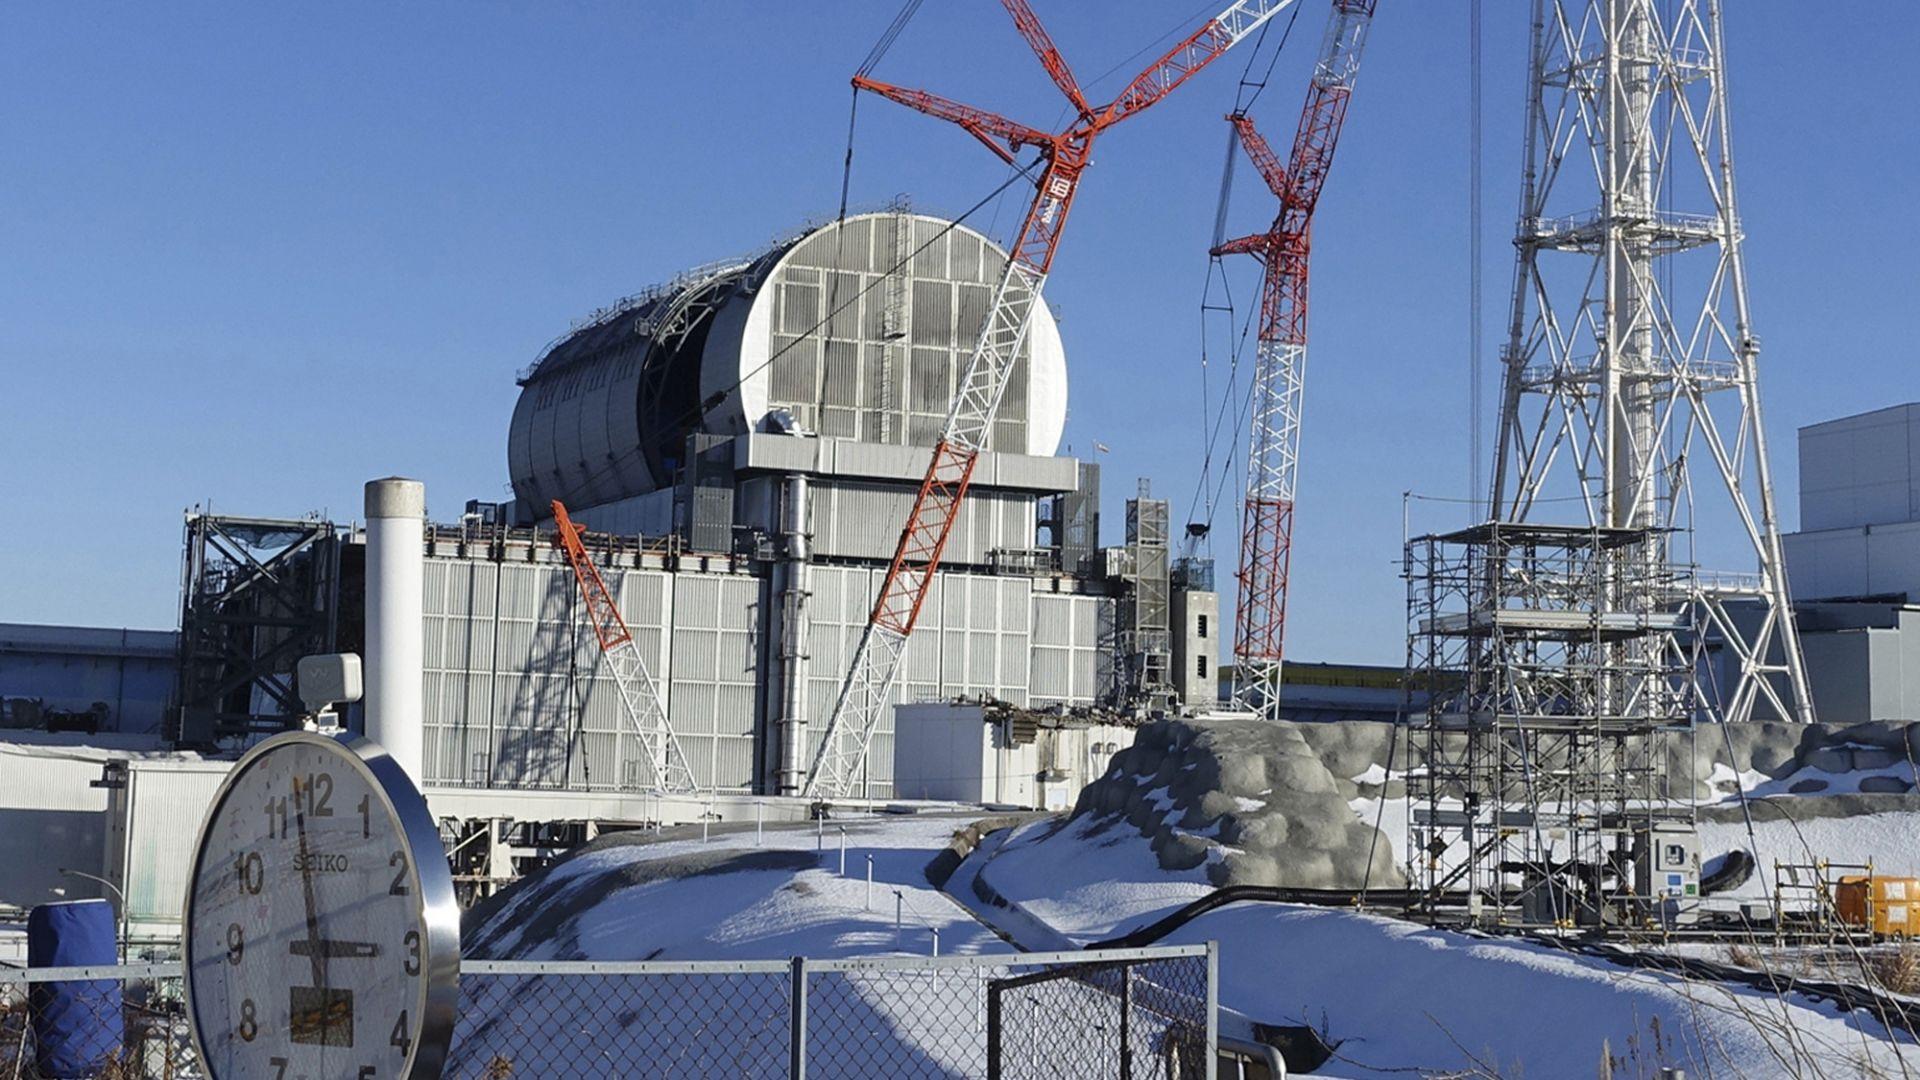 Експертен доклад: Ядрената енергетика е прекалено тромава и скъпа, за да спаси климата